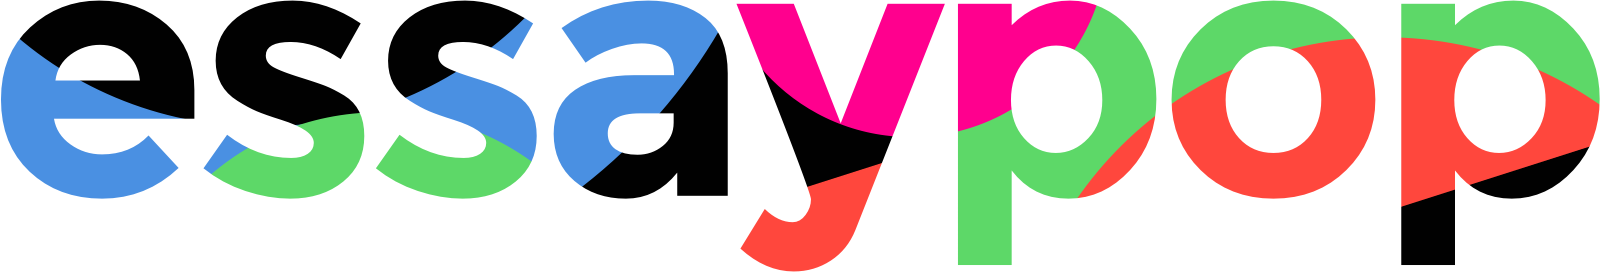 esssaypop logo